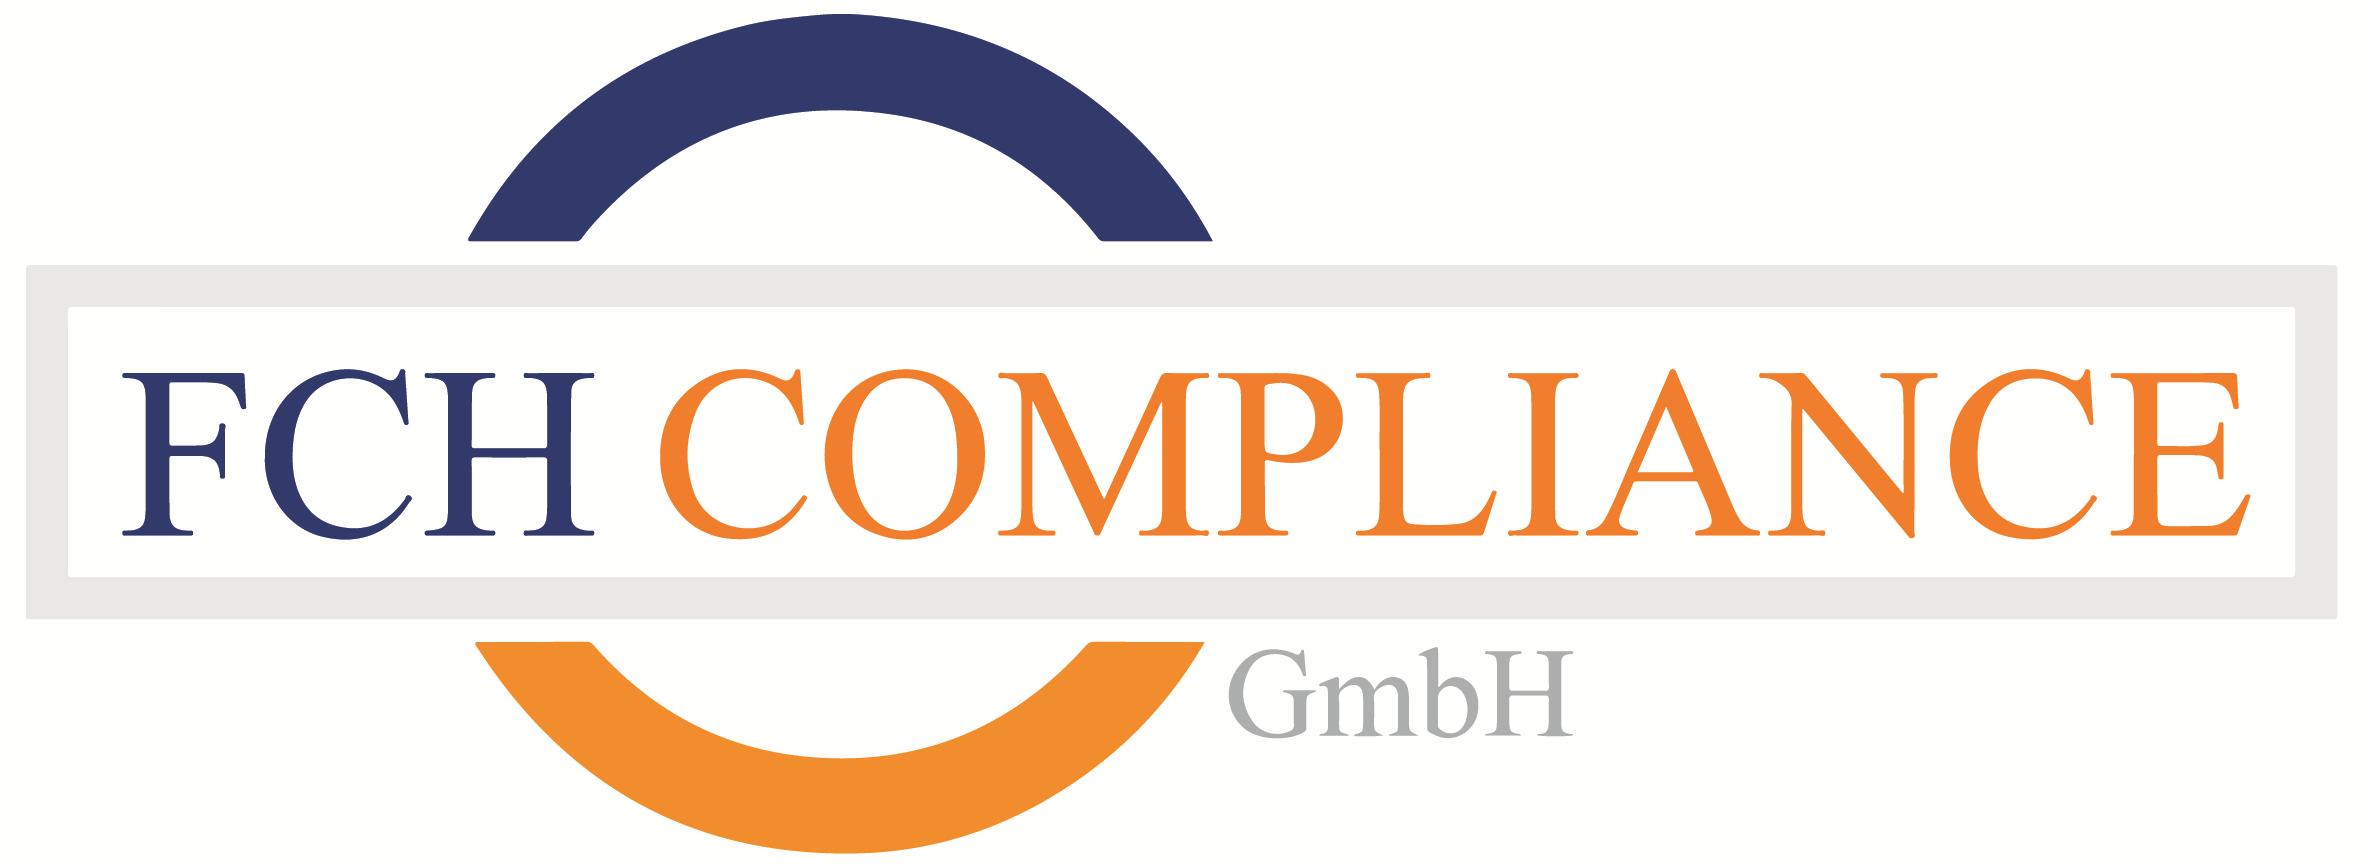 FCH Compliance GmbH Logo